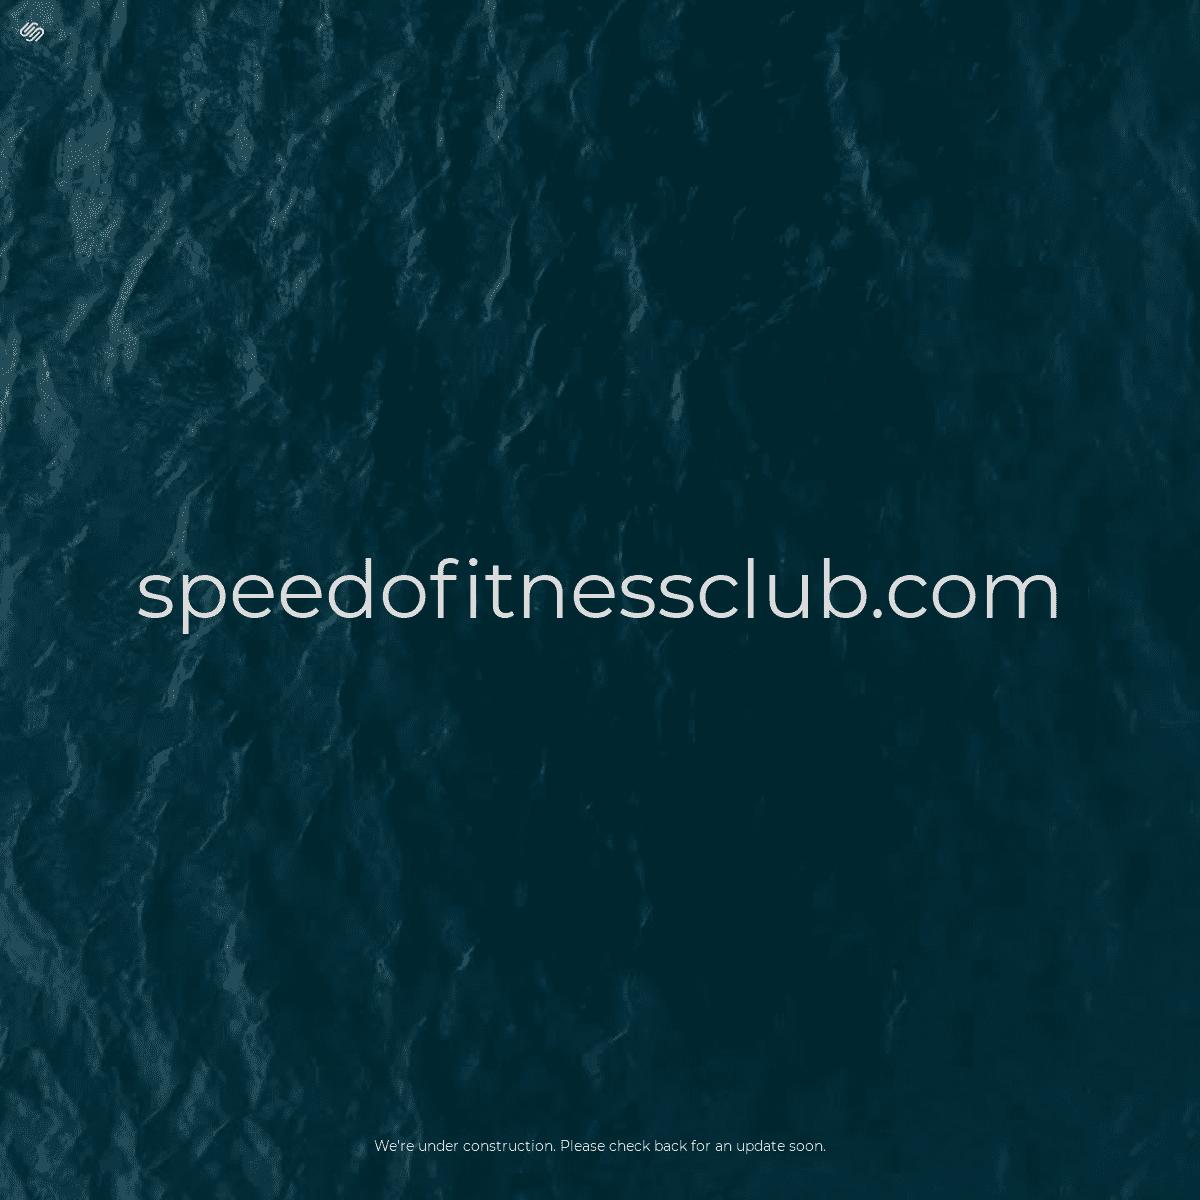 ArchiveBay.com - speedofitness.club - Coming Soon